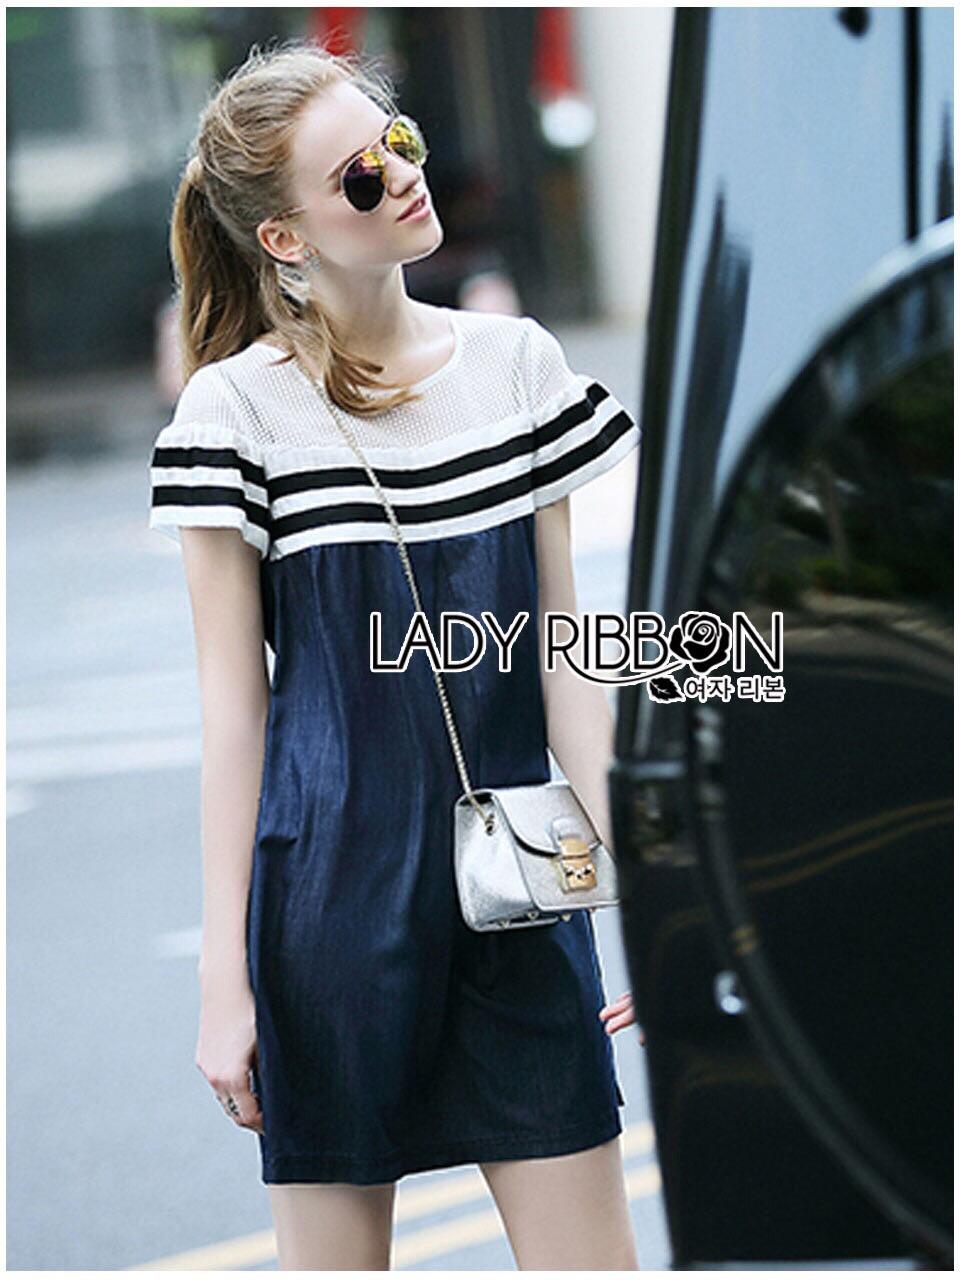 Lady Ribbon KOrea Denim Dress LR03130616 &#x1F380 Lady Ribbon's Made &#x1F380 Lady Aurelie Sporty Minimal Striped Denim Dress เดรสผ้าเดนิม